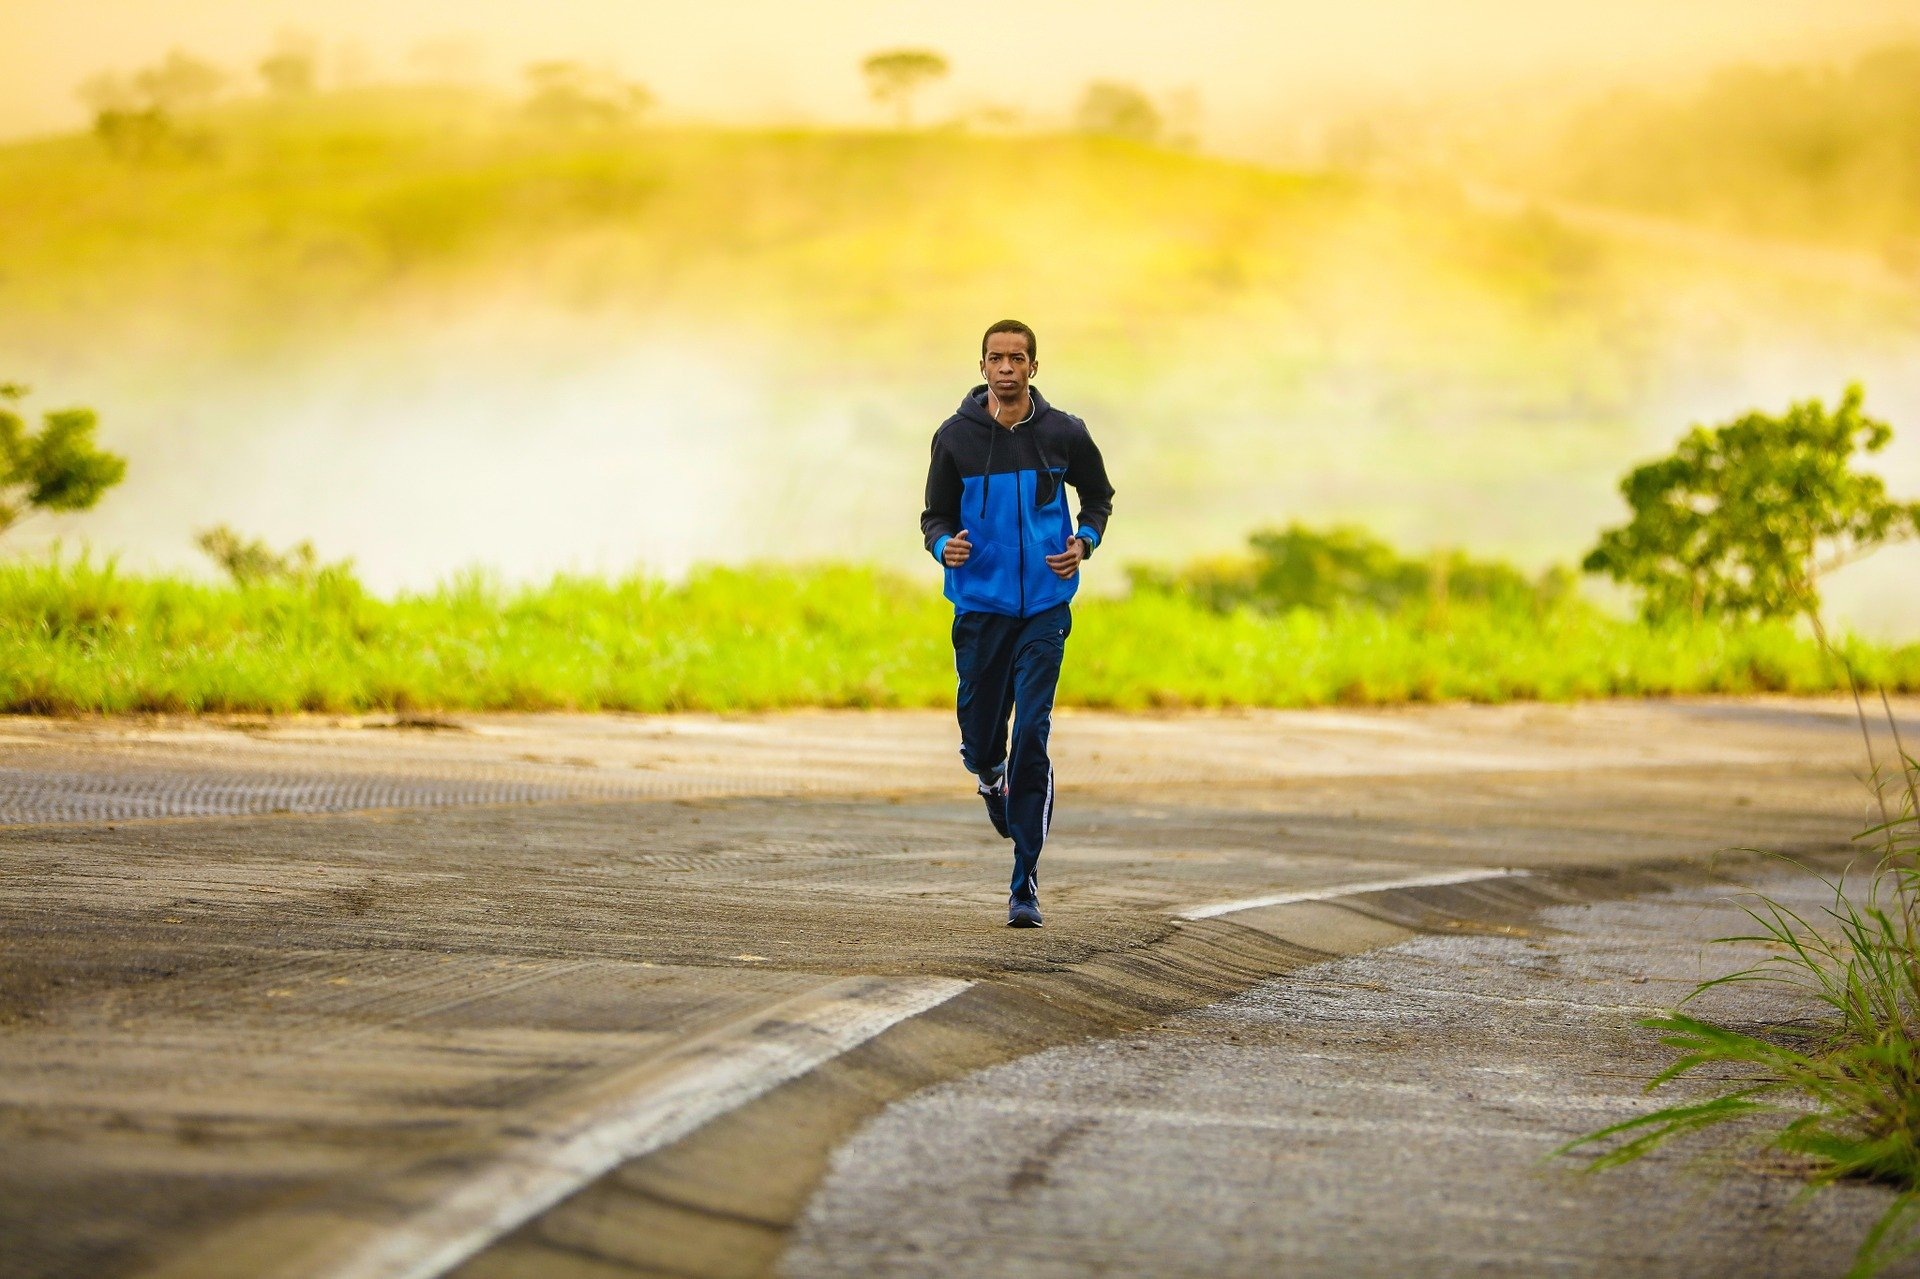 mand løber i naturen